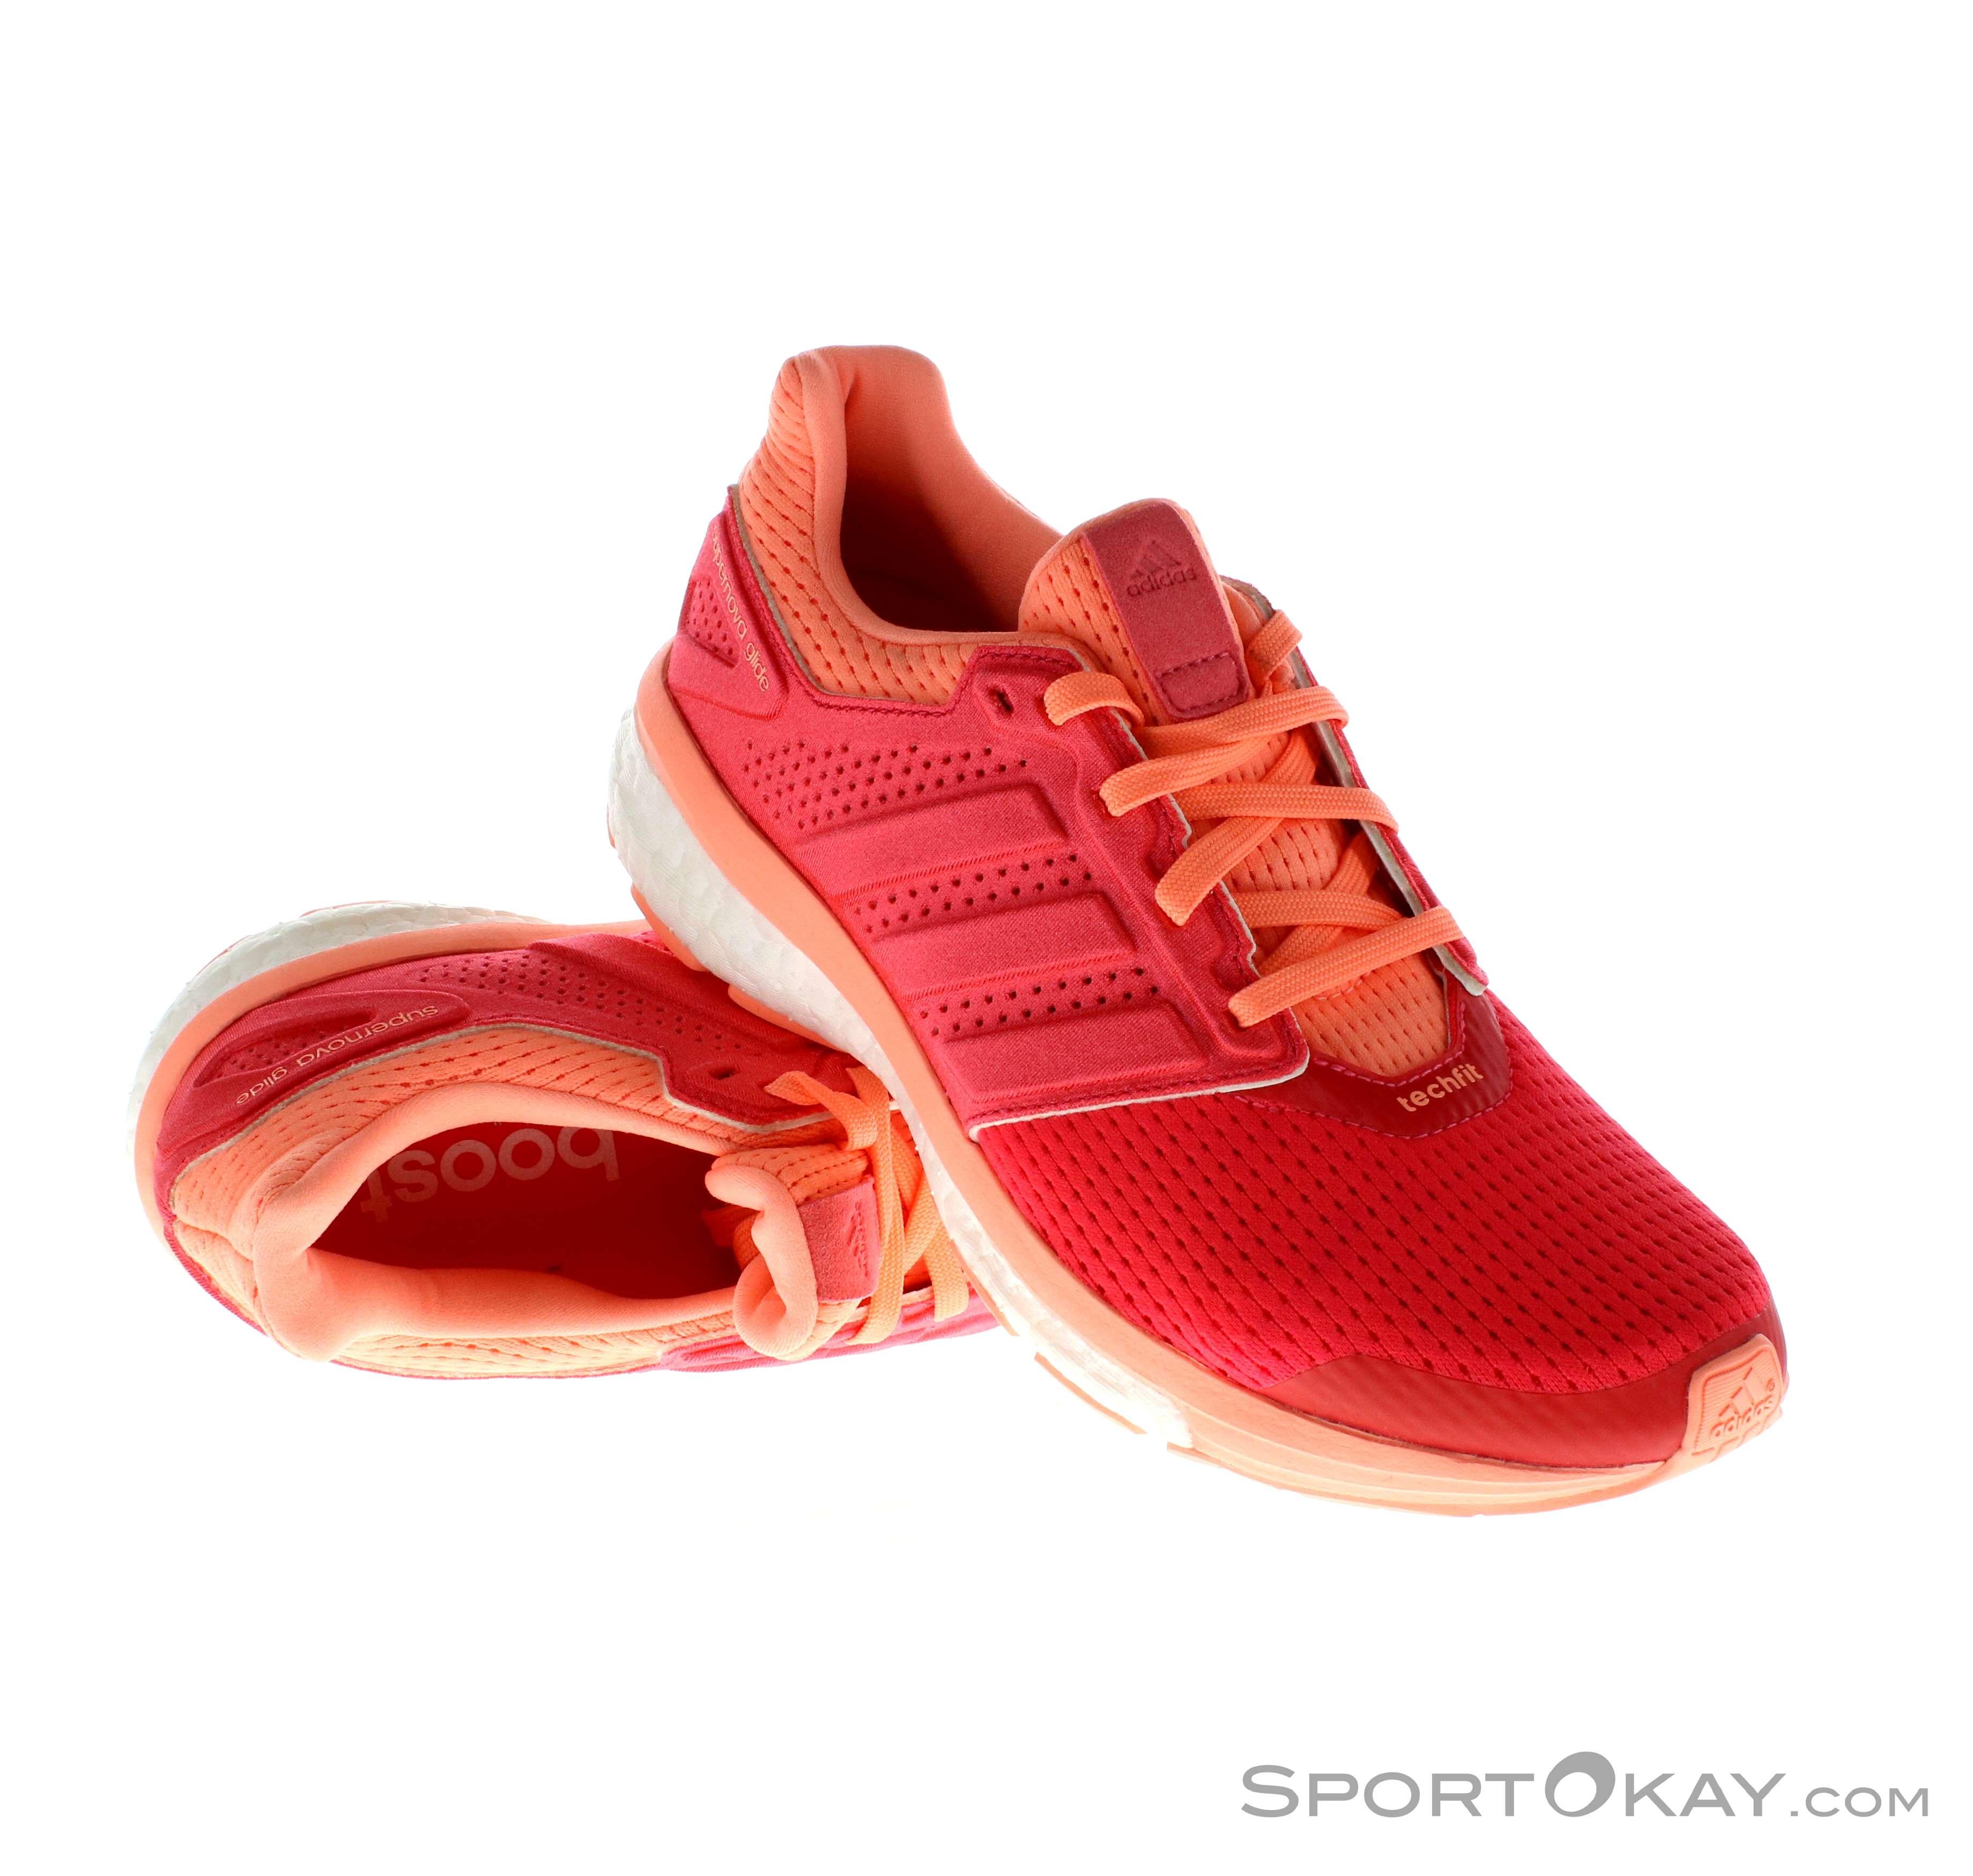 adidas adidas Supernova Glide Boost 8 Womens Running Shoes